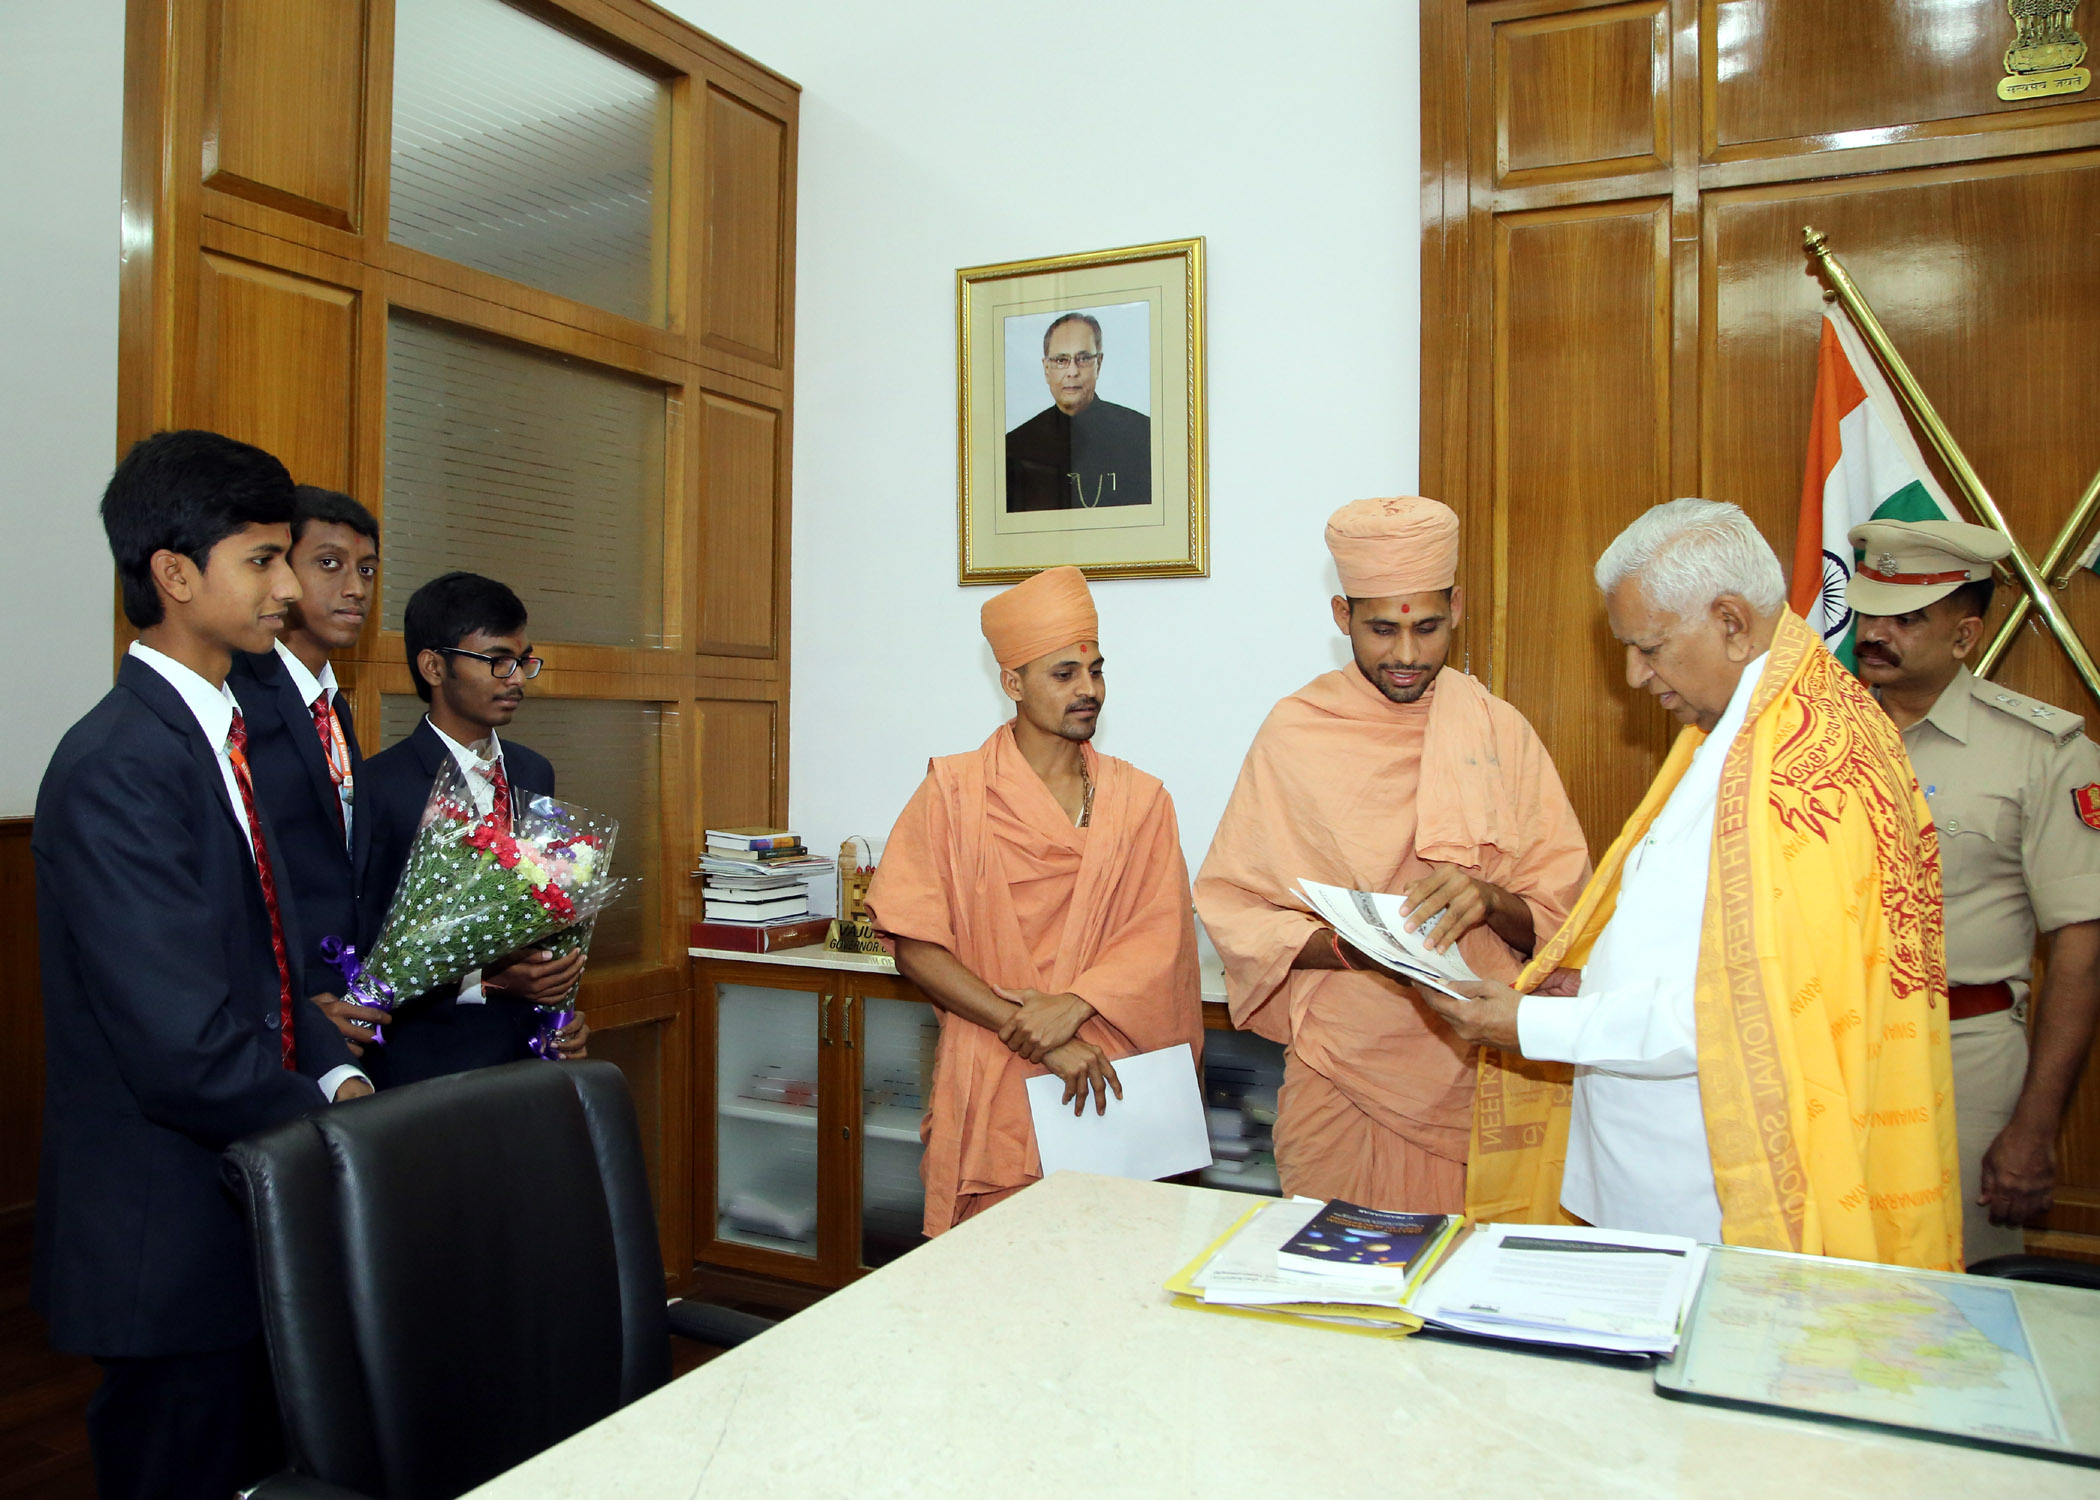 Saints of Swamy Narayan met Vajubhai Vala